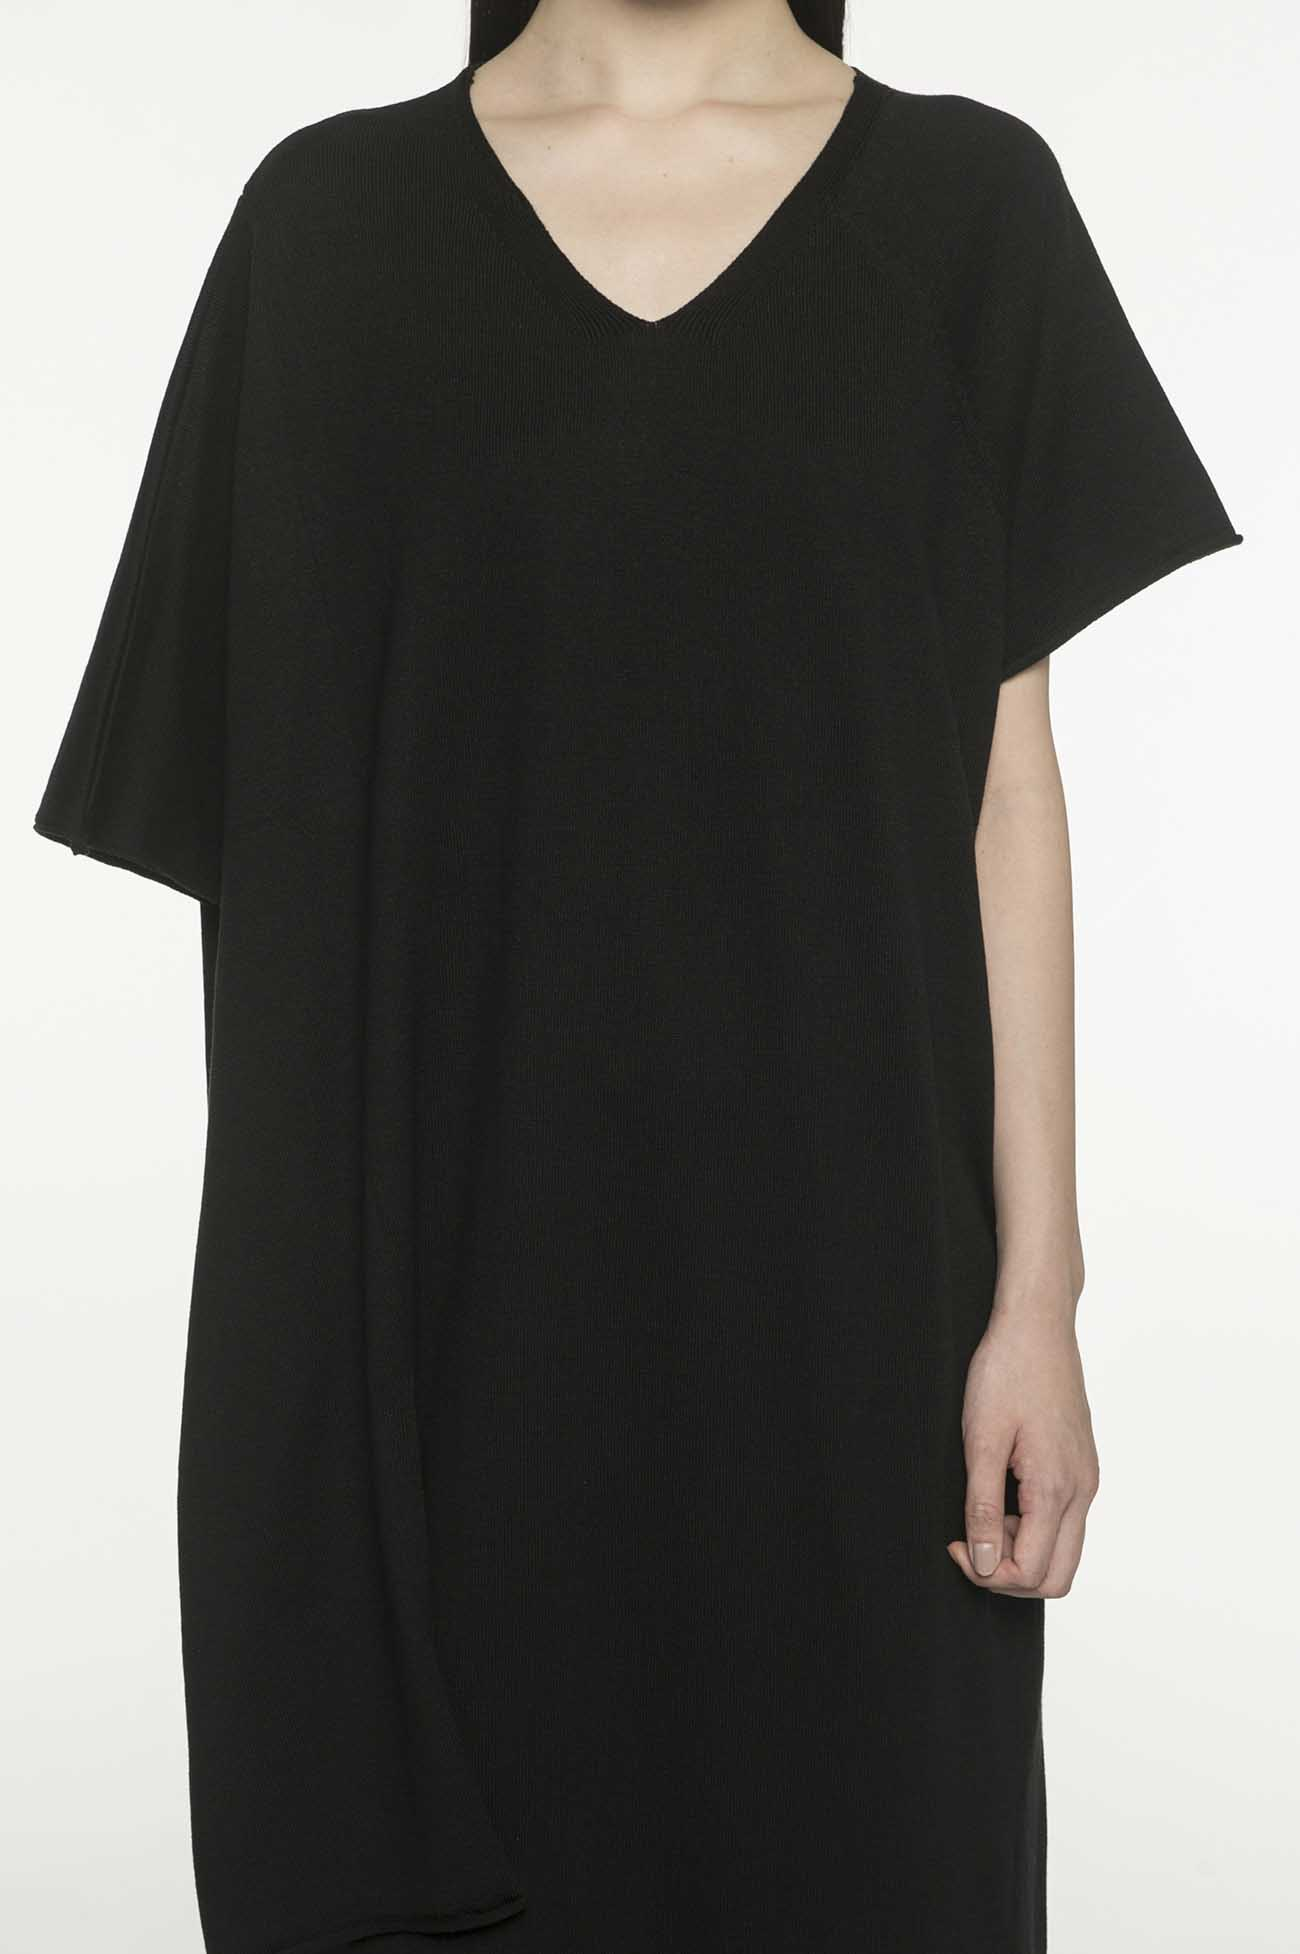 RISMATby Y's丙烯酸棉度Amatenji不对称针织连衣裙